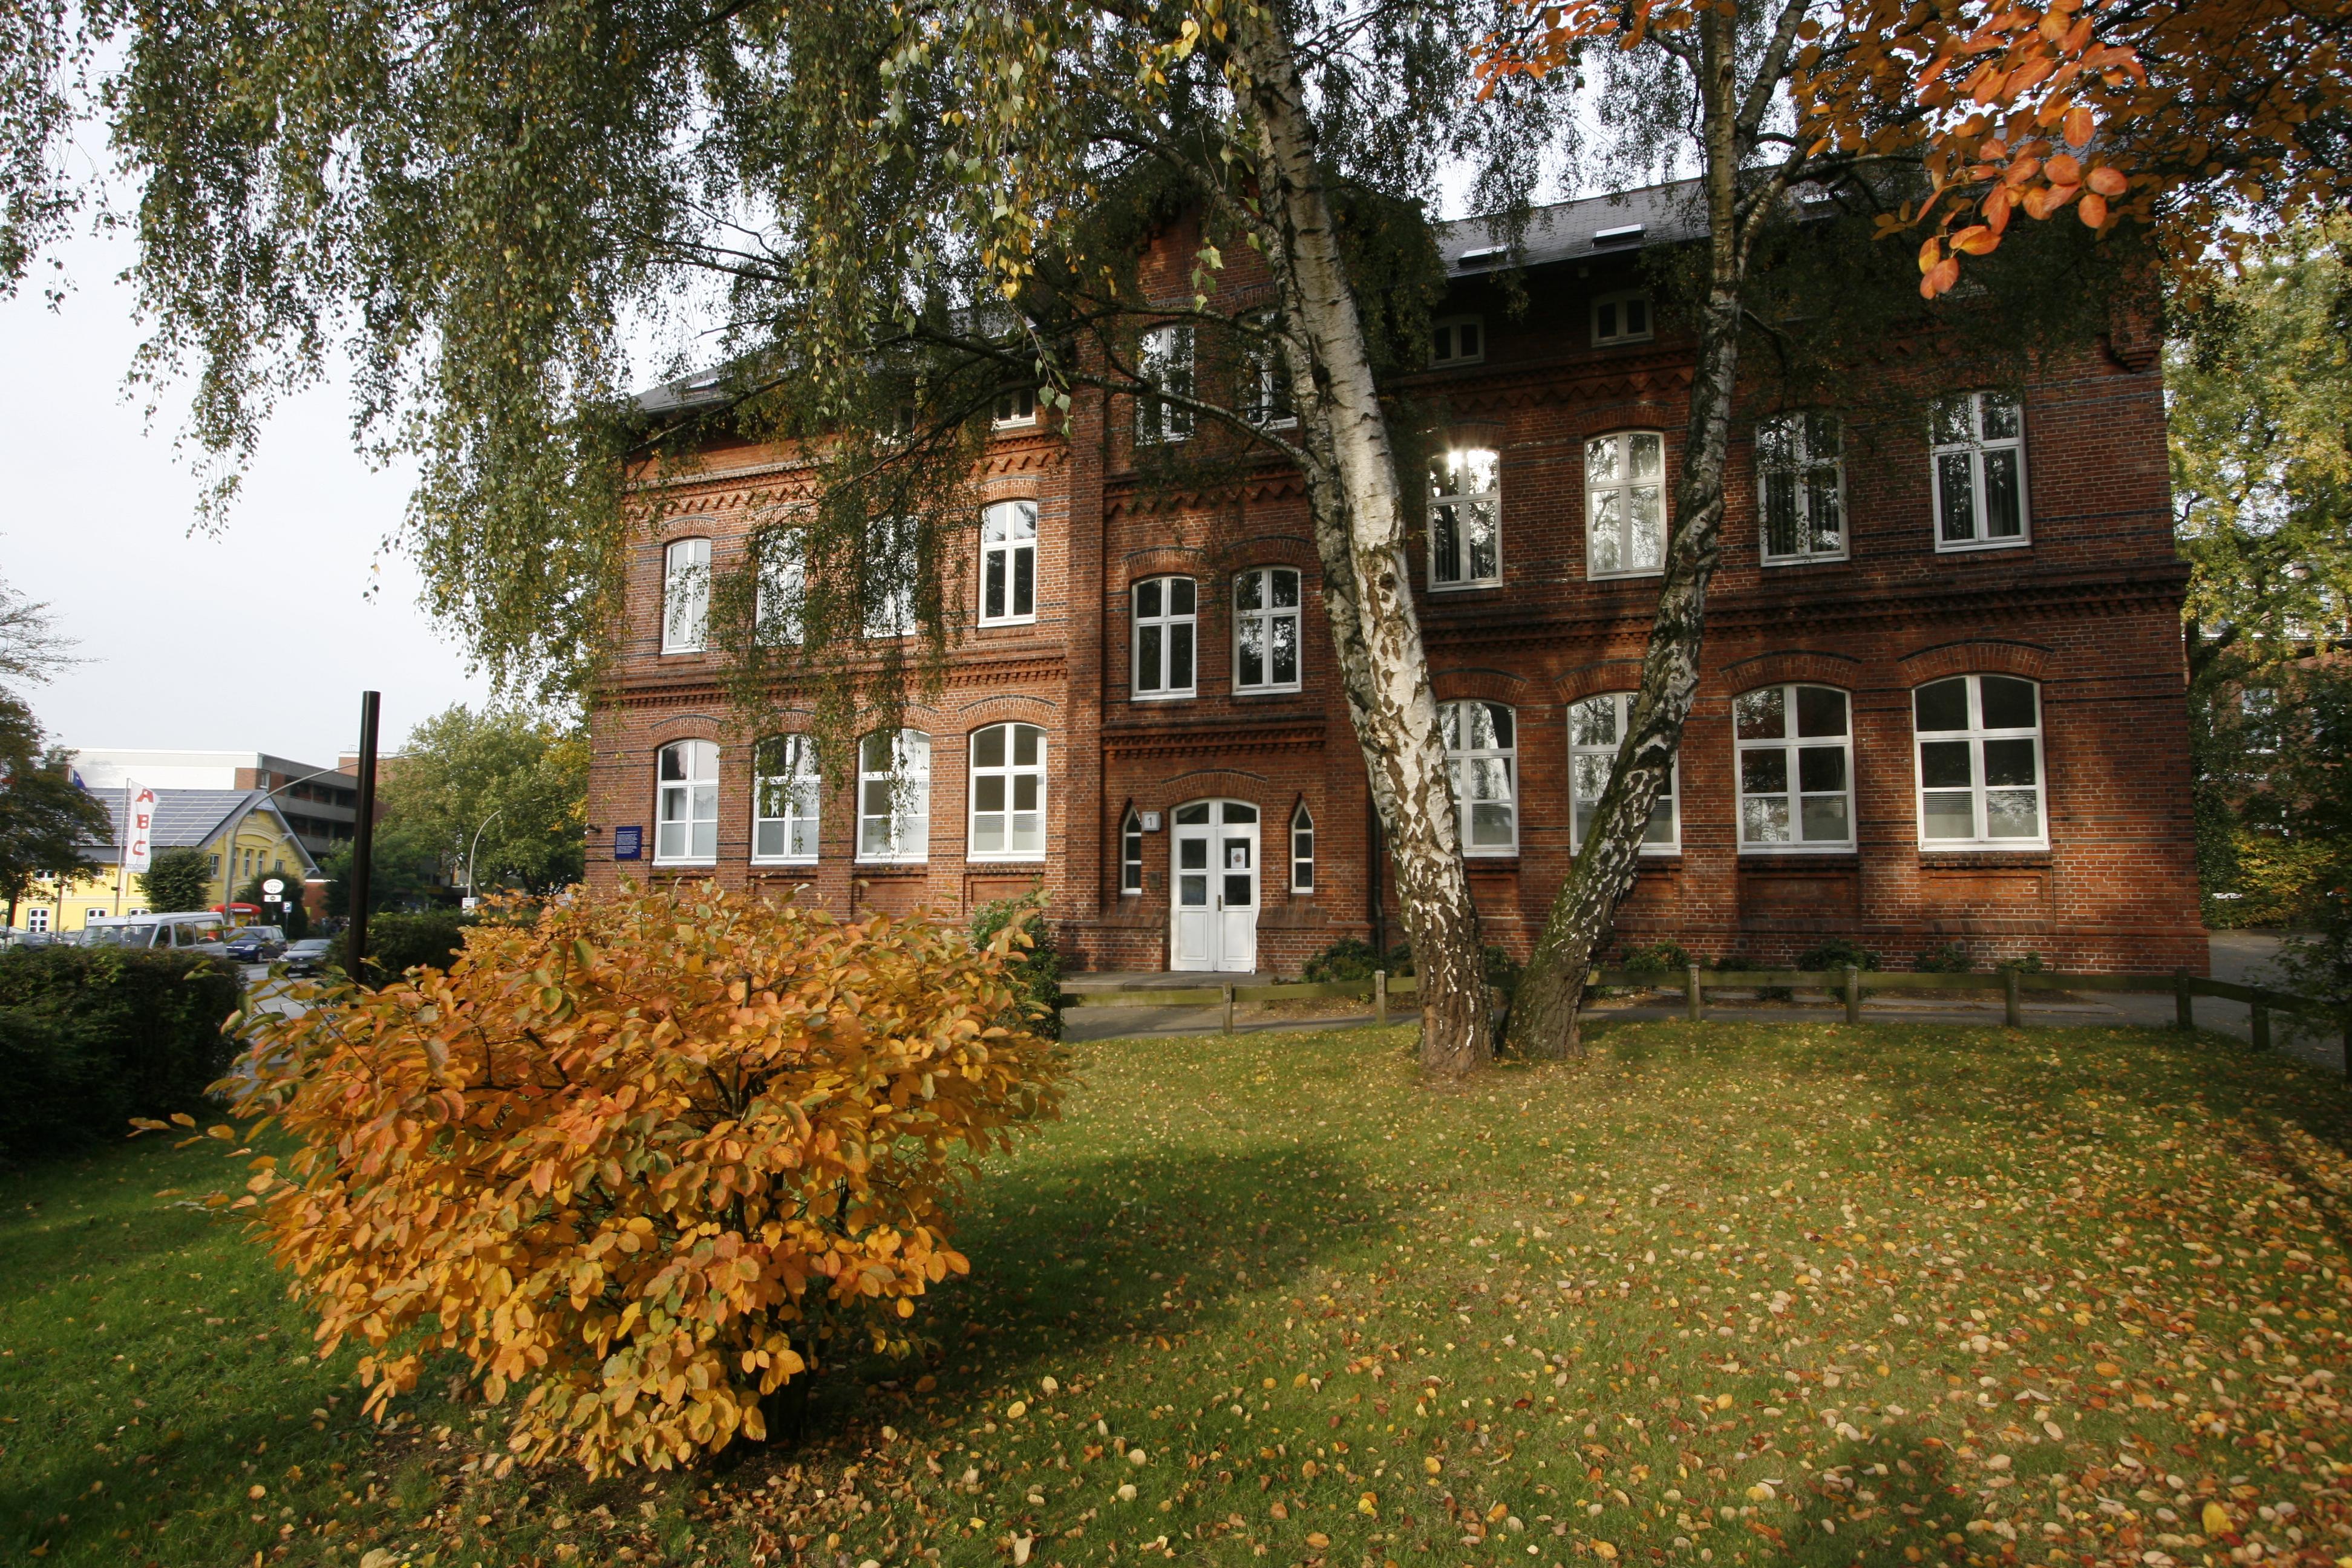 Bezirksamt Wandsbek Bilddatenbank Bramfeld Fhh